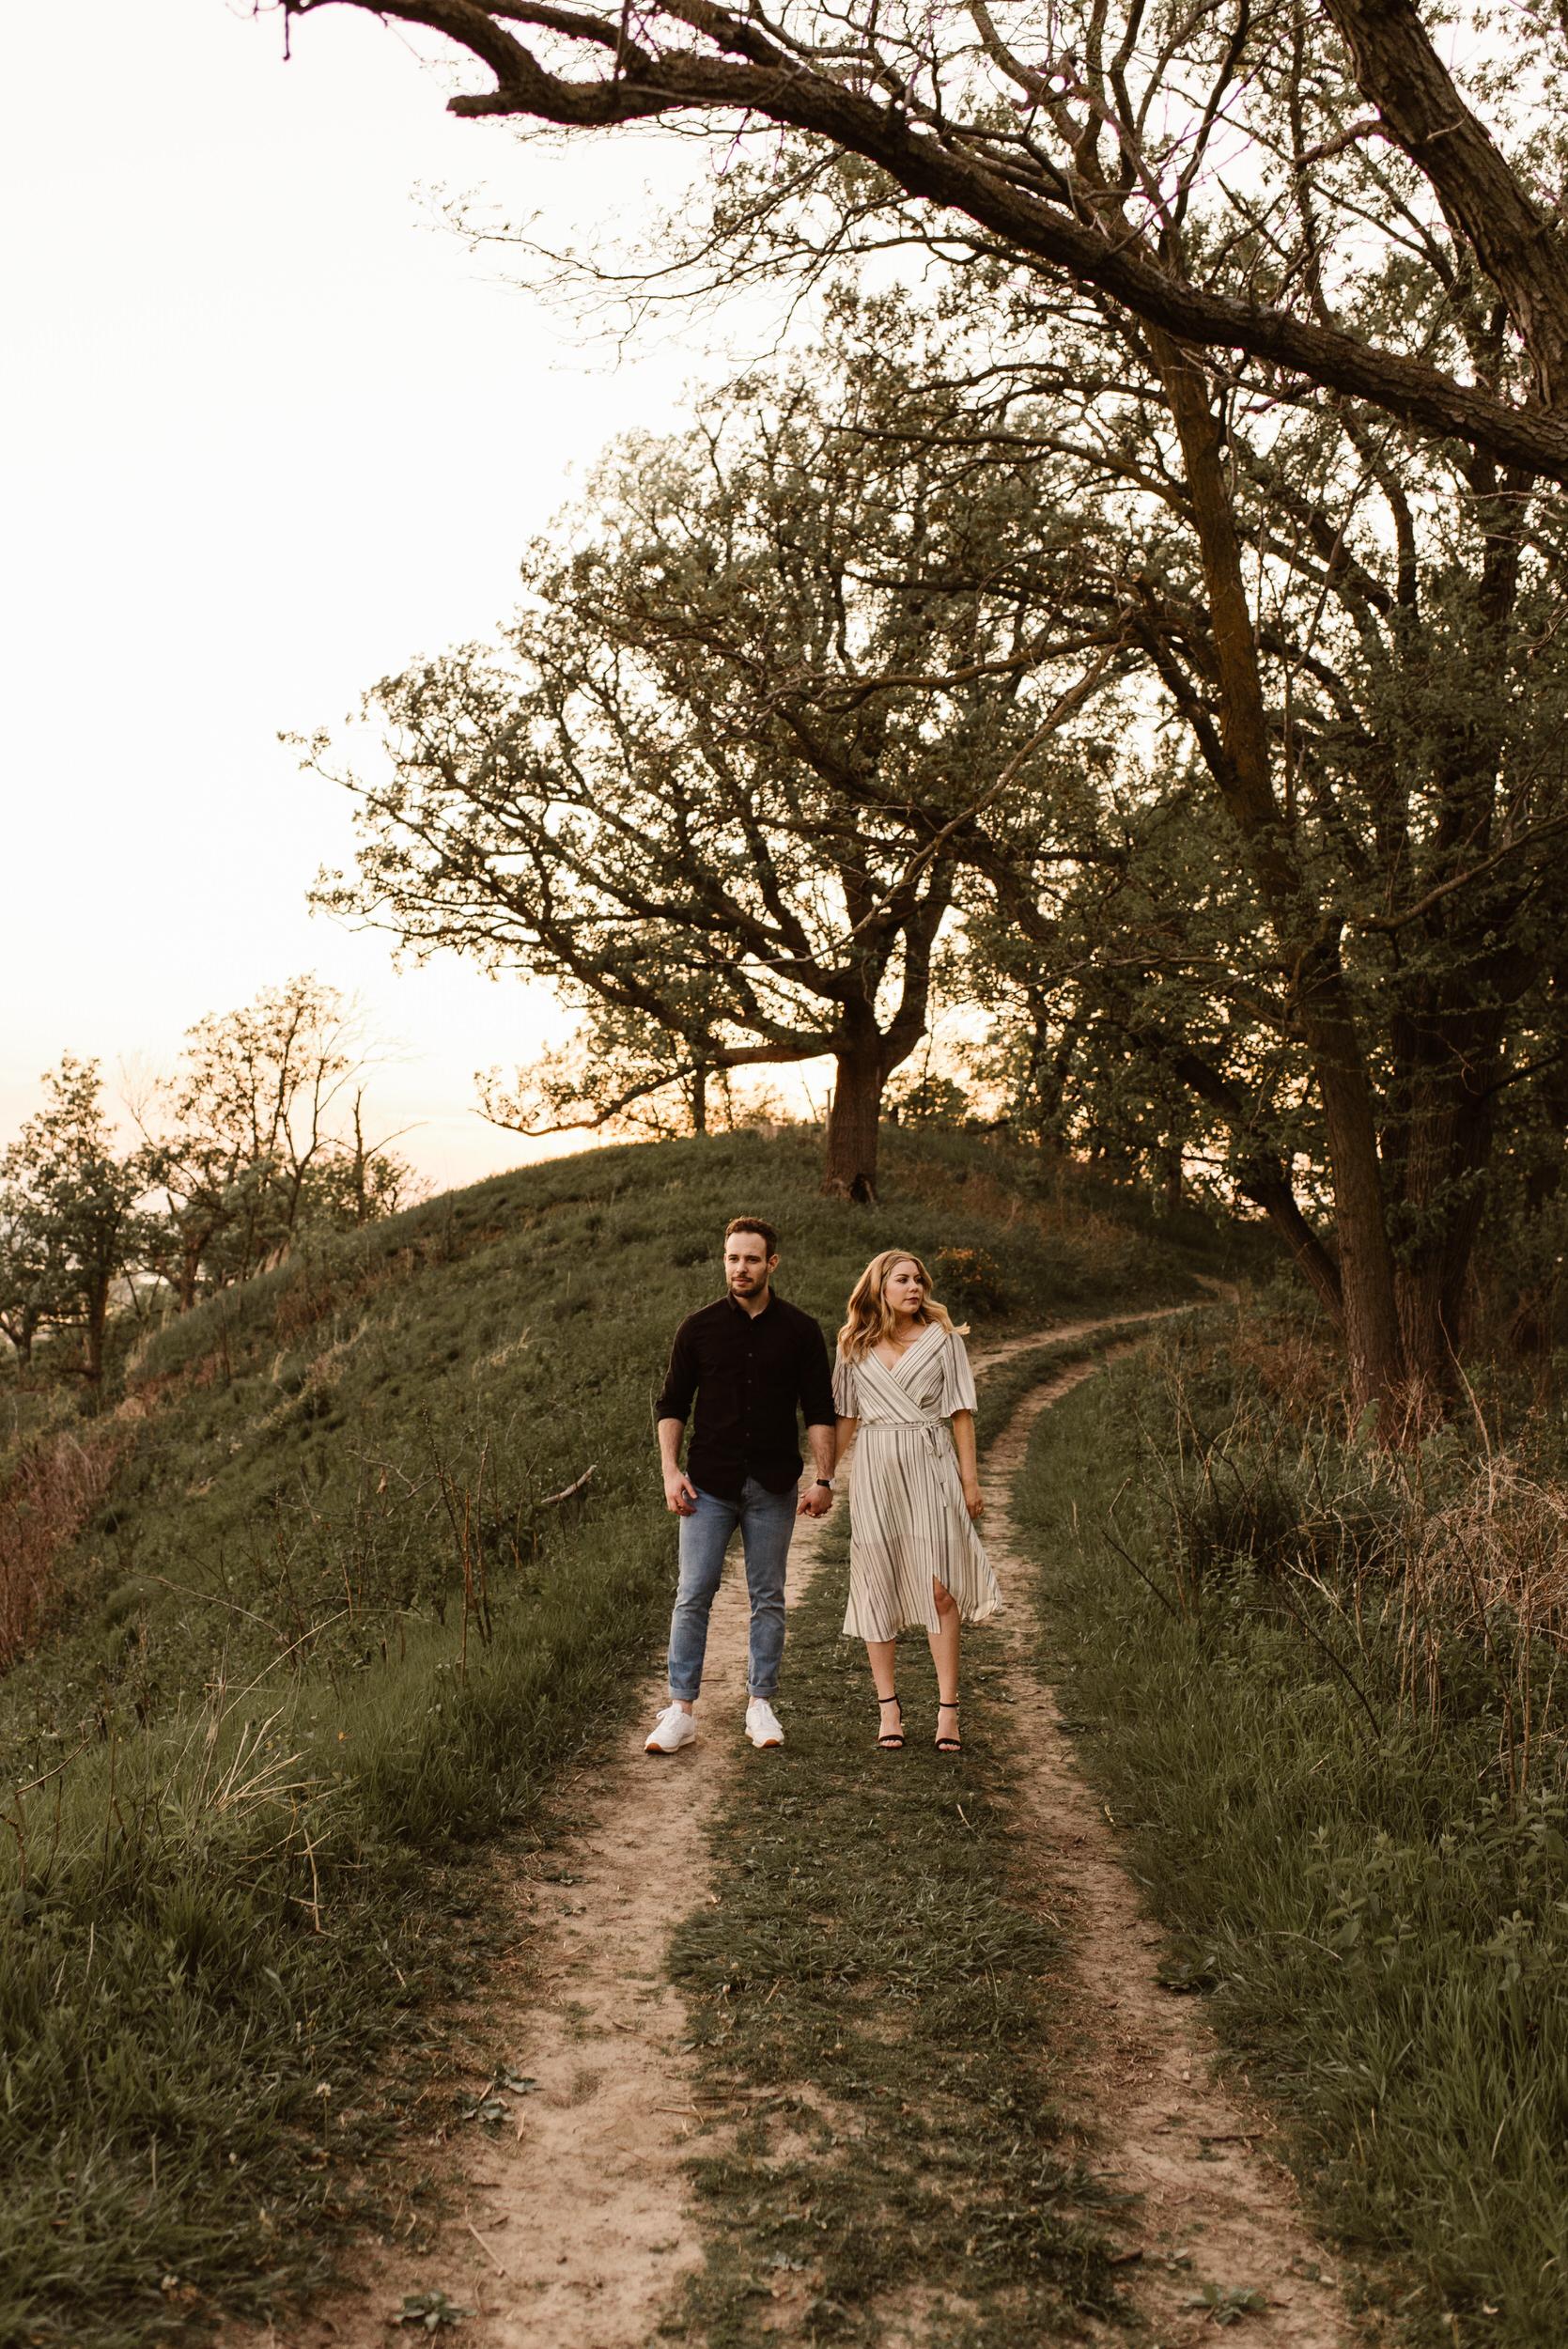 Omaha-Nebraska-Engagement-Session-Kaylie-Sirek-Photography-169.jpg